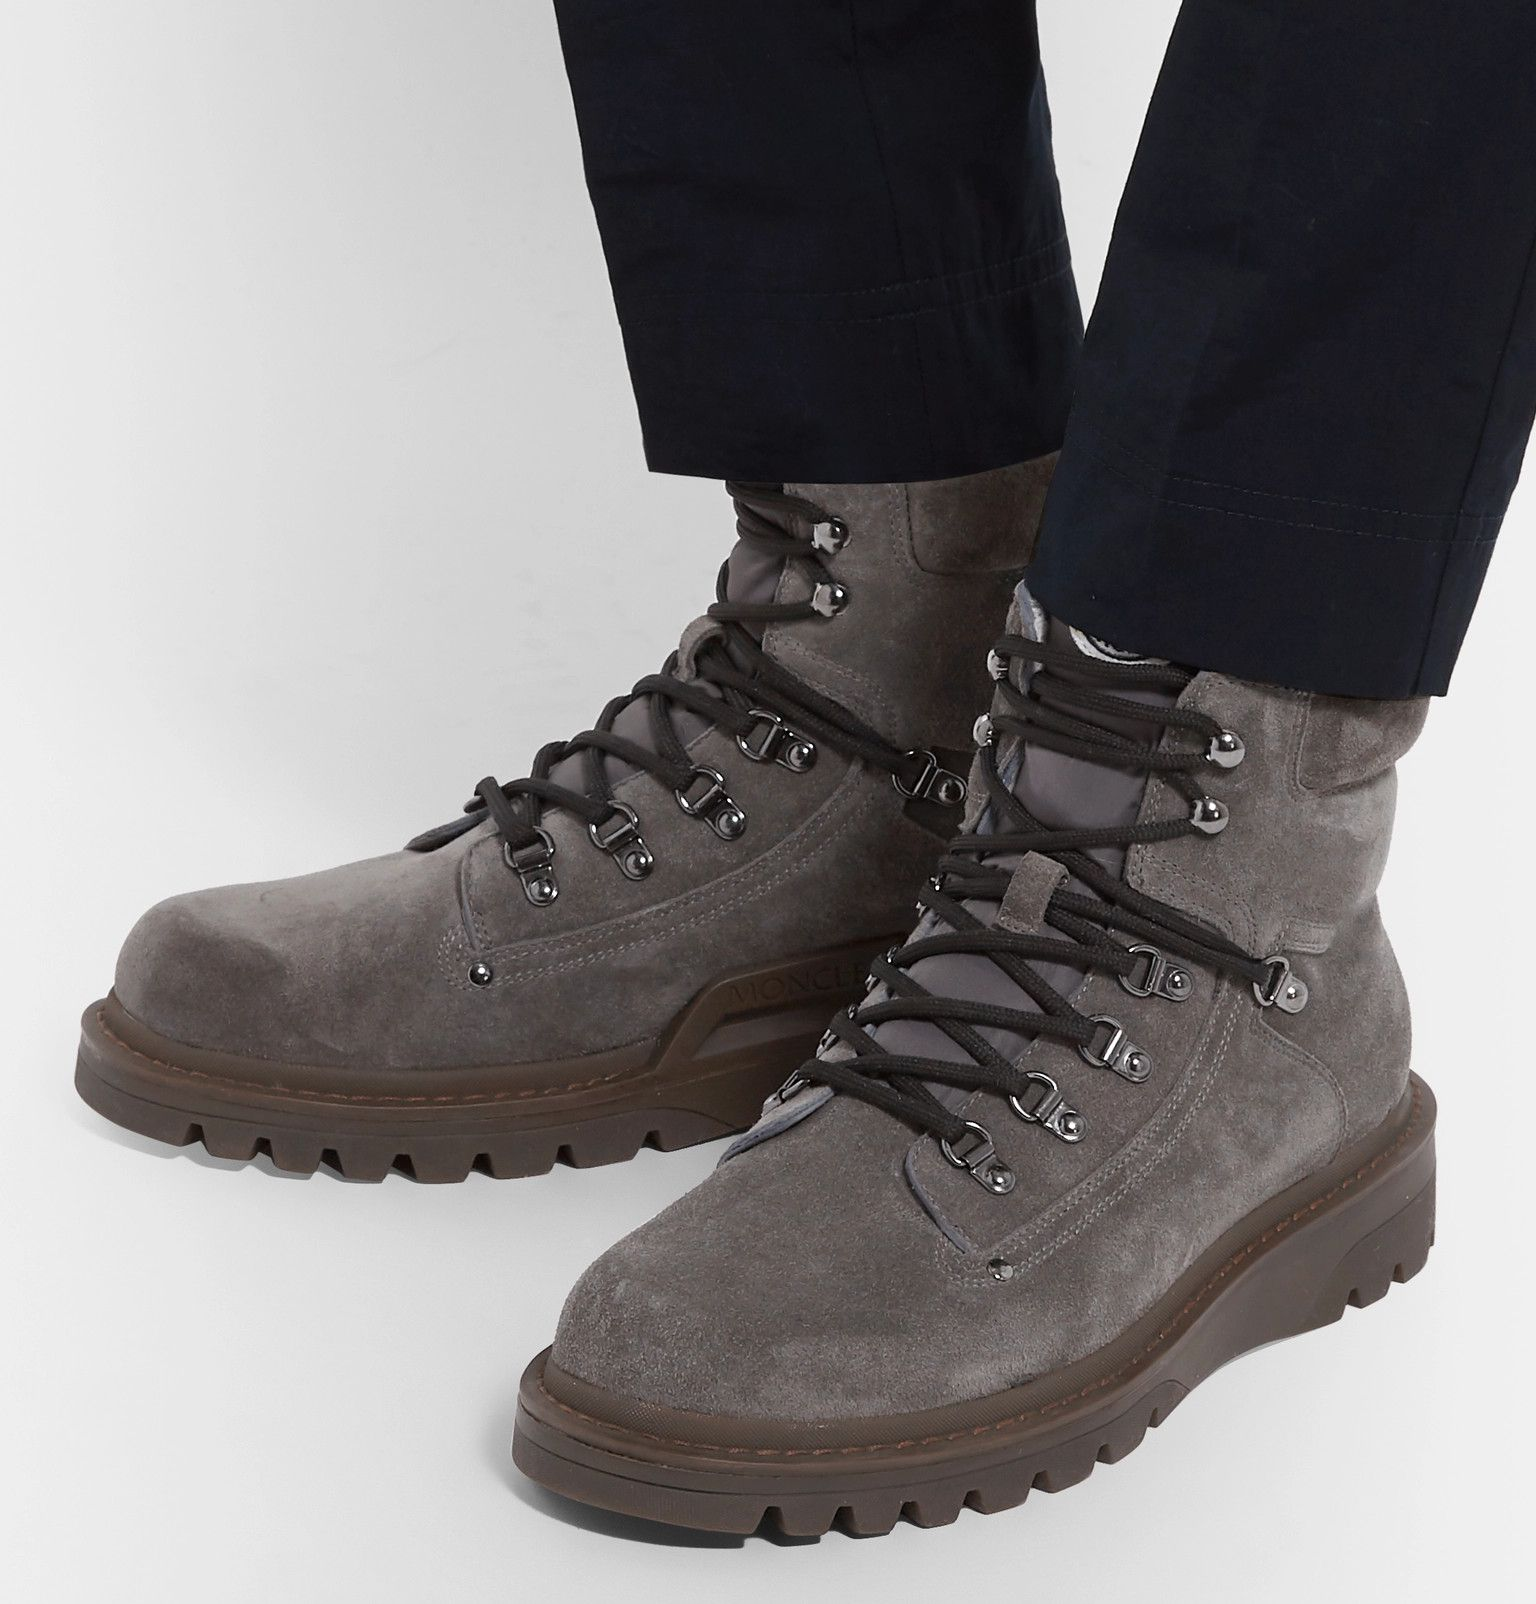 0b1b526b6b4a Moncler - Egide Shearling-Lined Suede Walking Boots